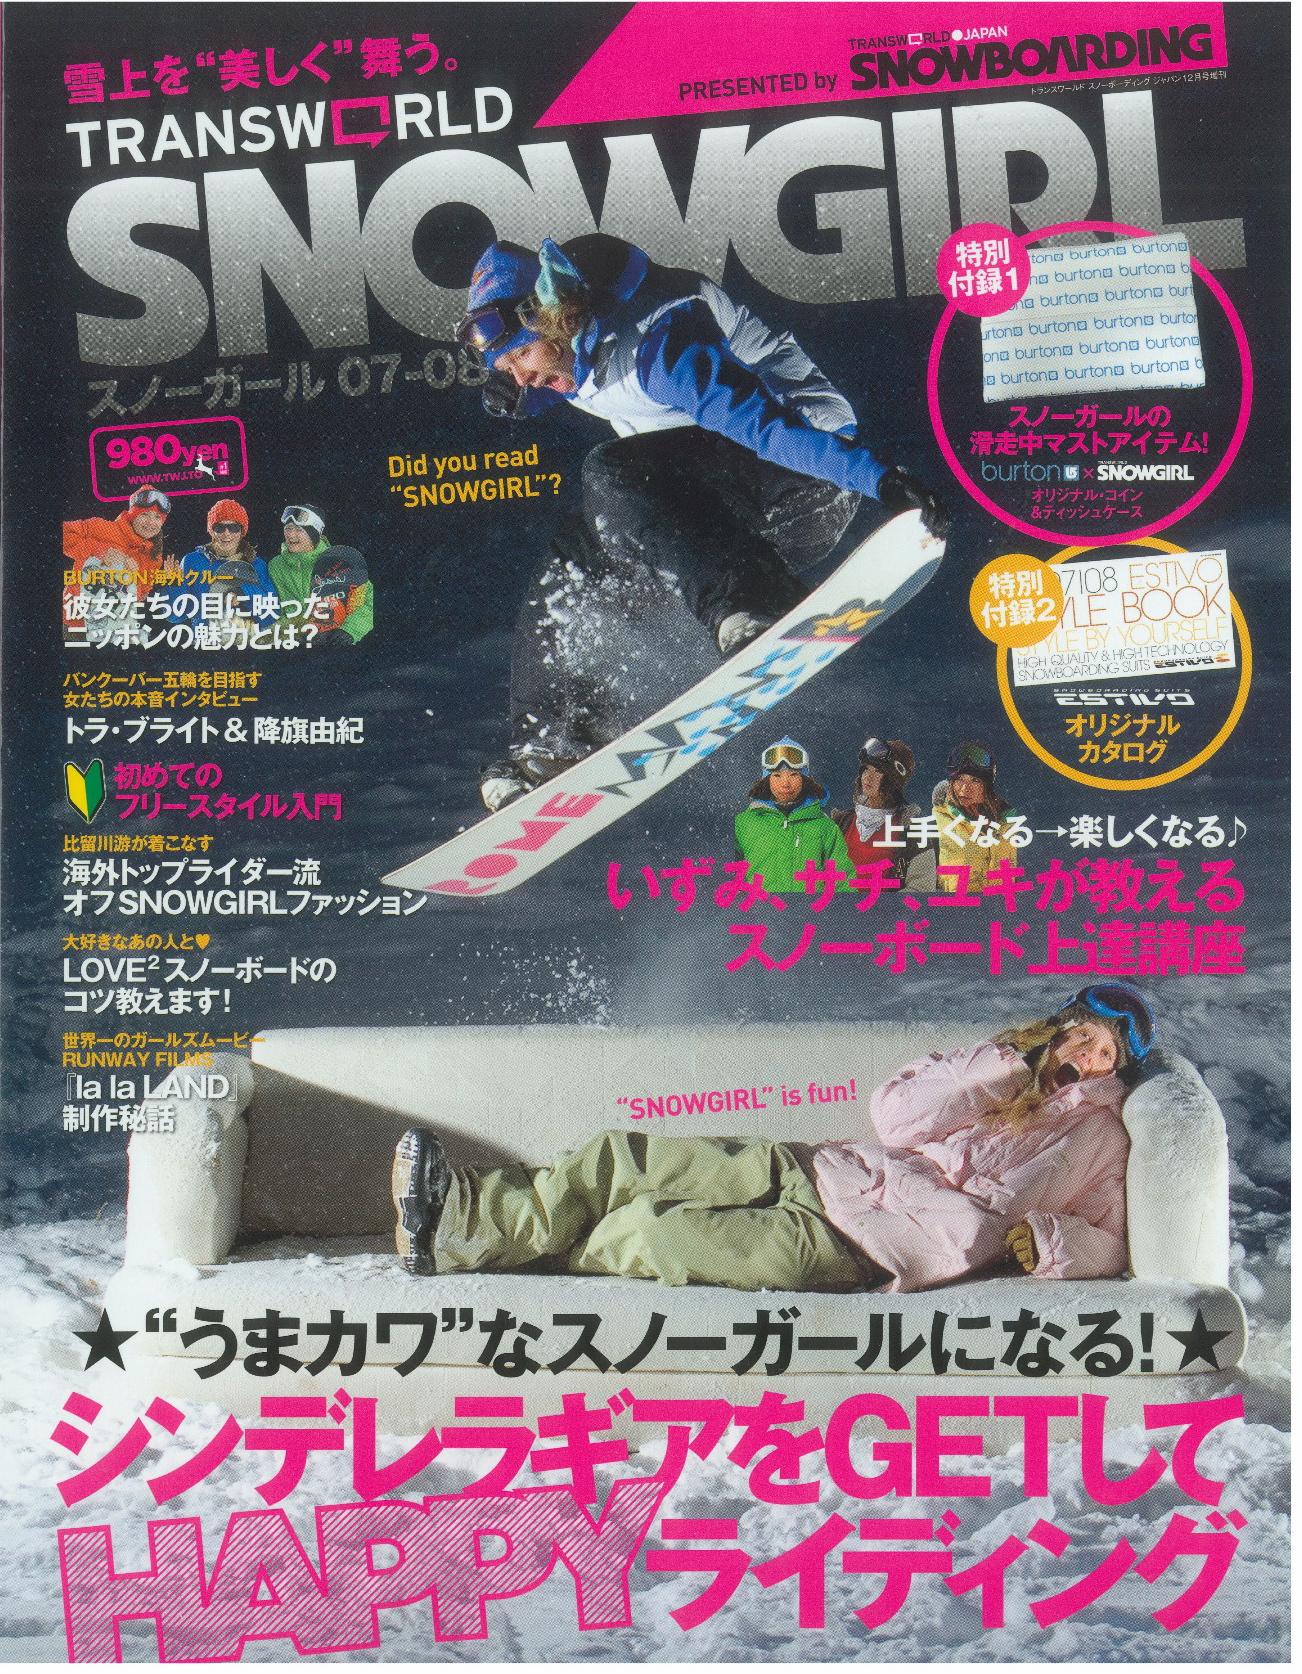 transworld snowgirl japan cover.jpg